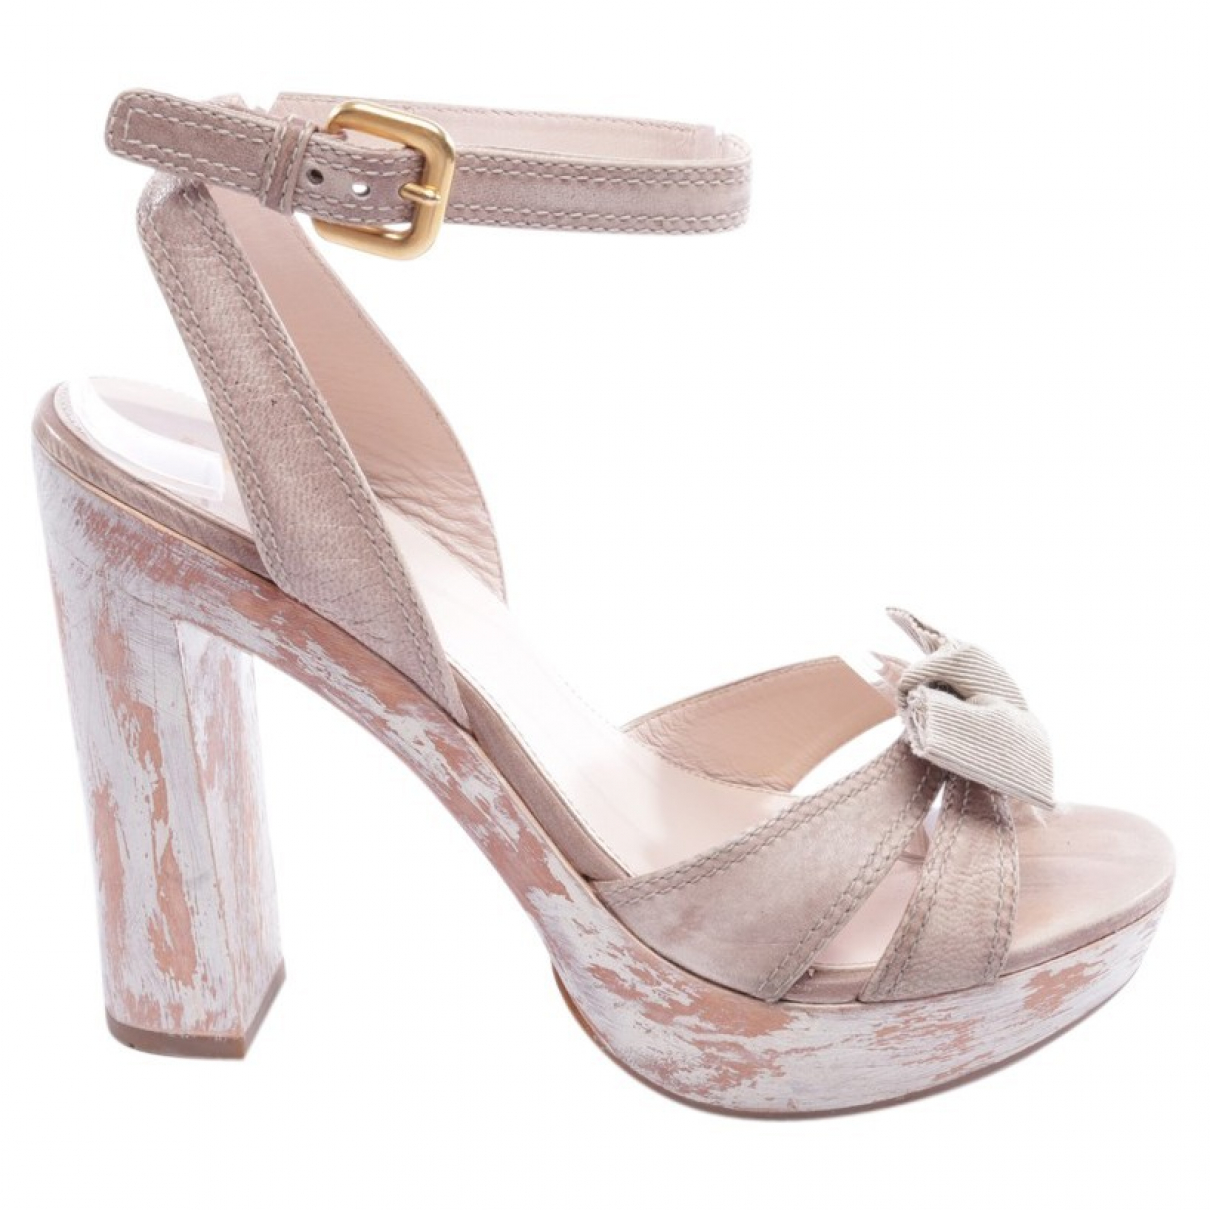 Prada N Beige Leather Sandals for Women 38 EU